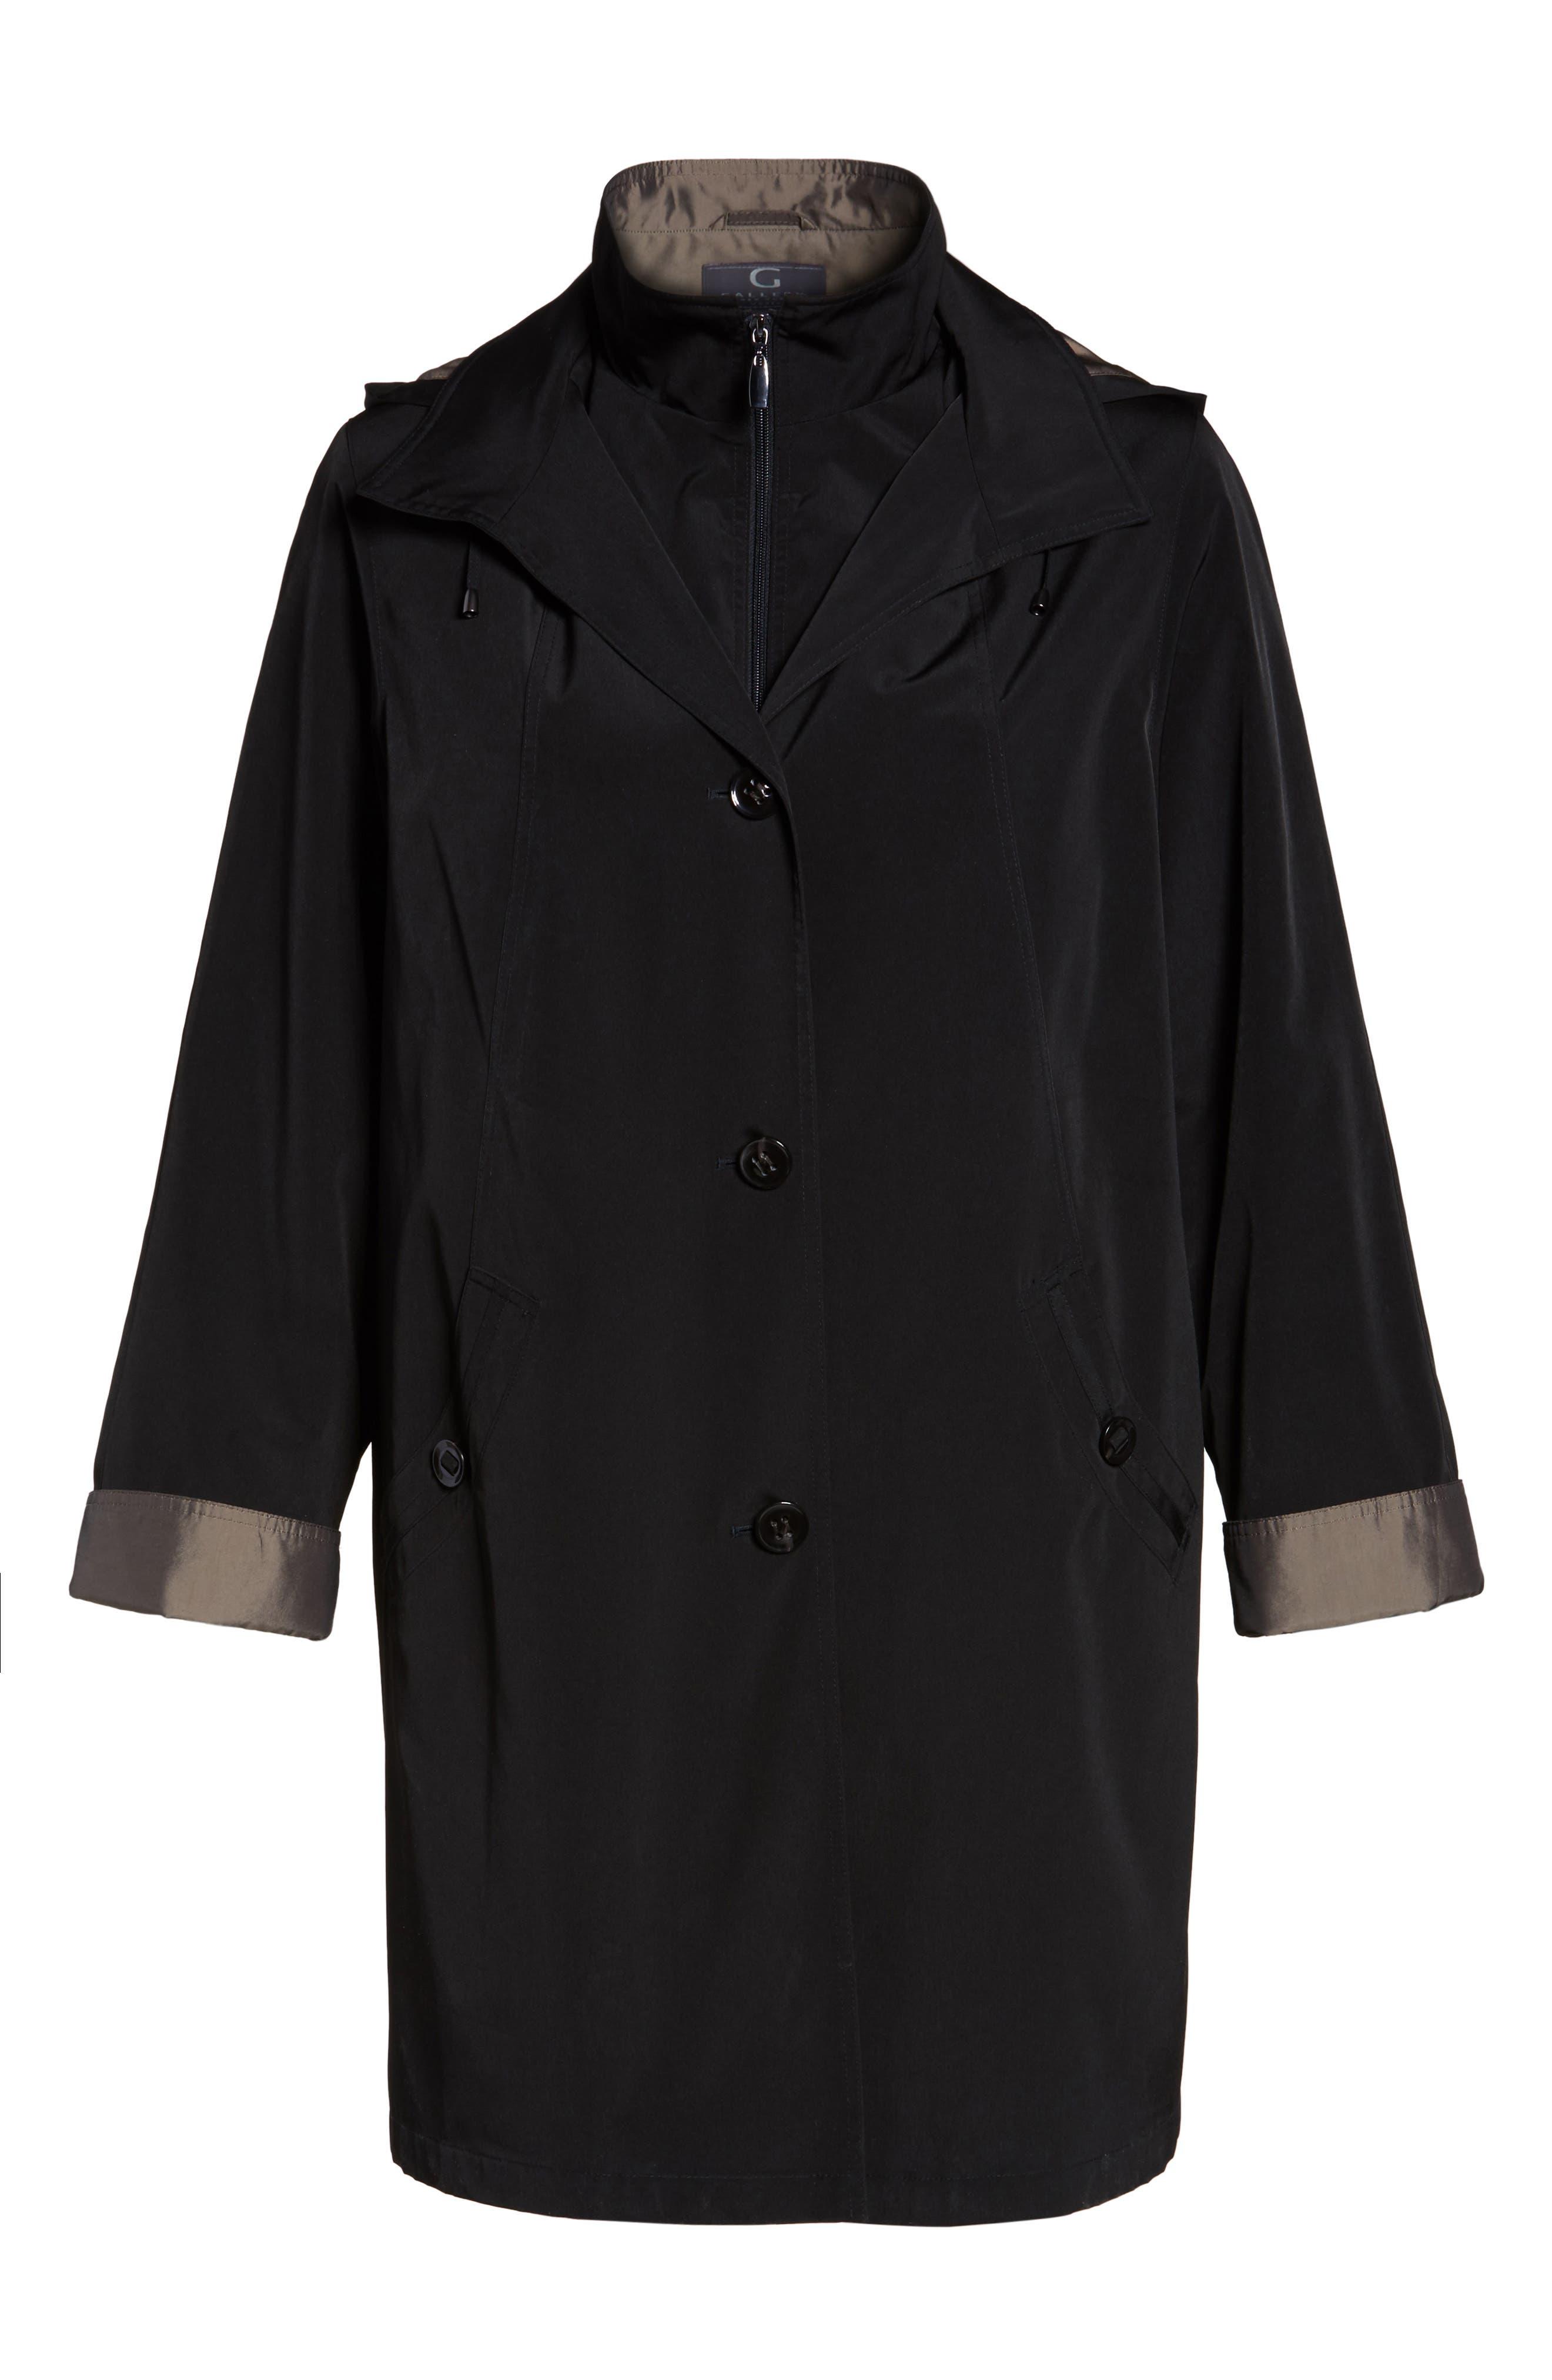 Two-Tone Long Silk Look Raincoat,                             Alternate thumbnail 6, color,                             BLACK